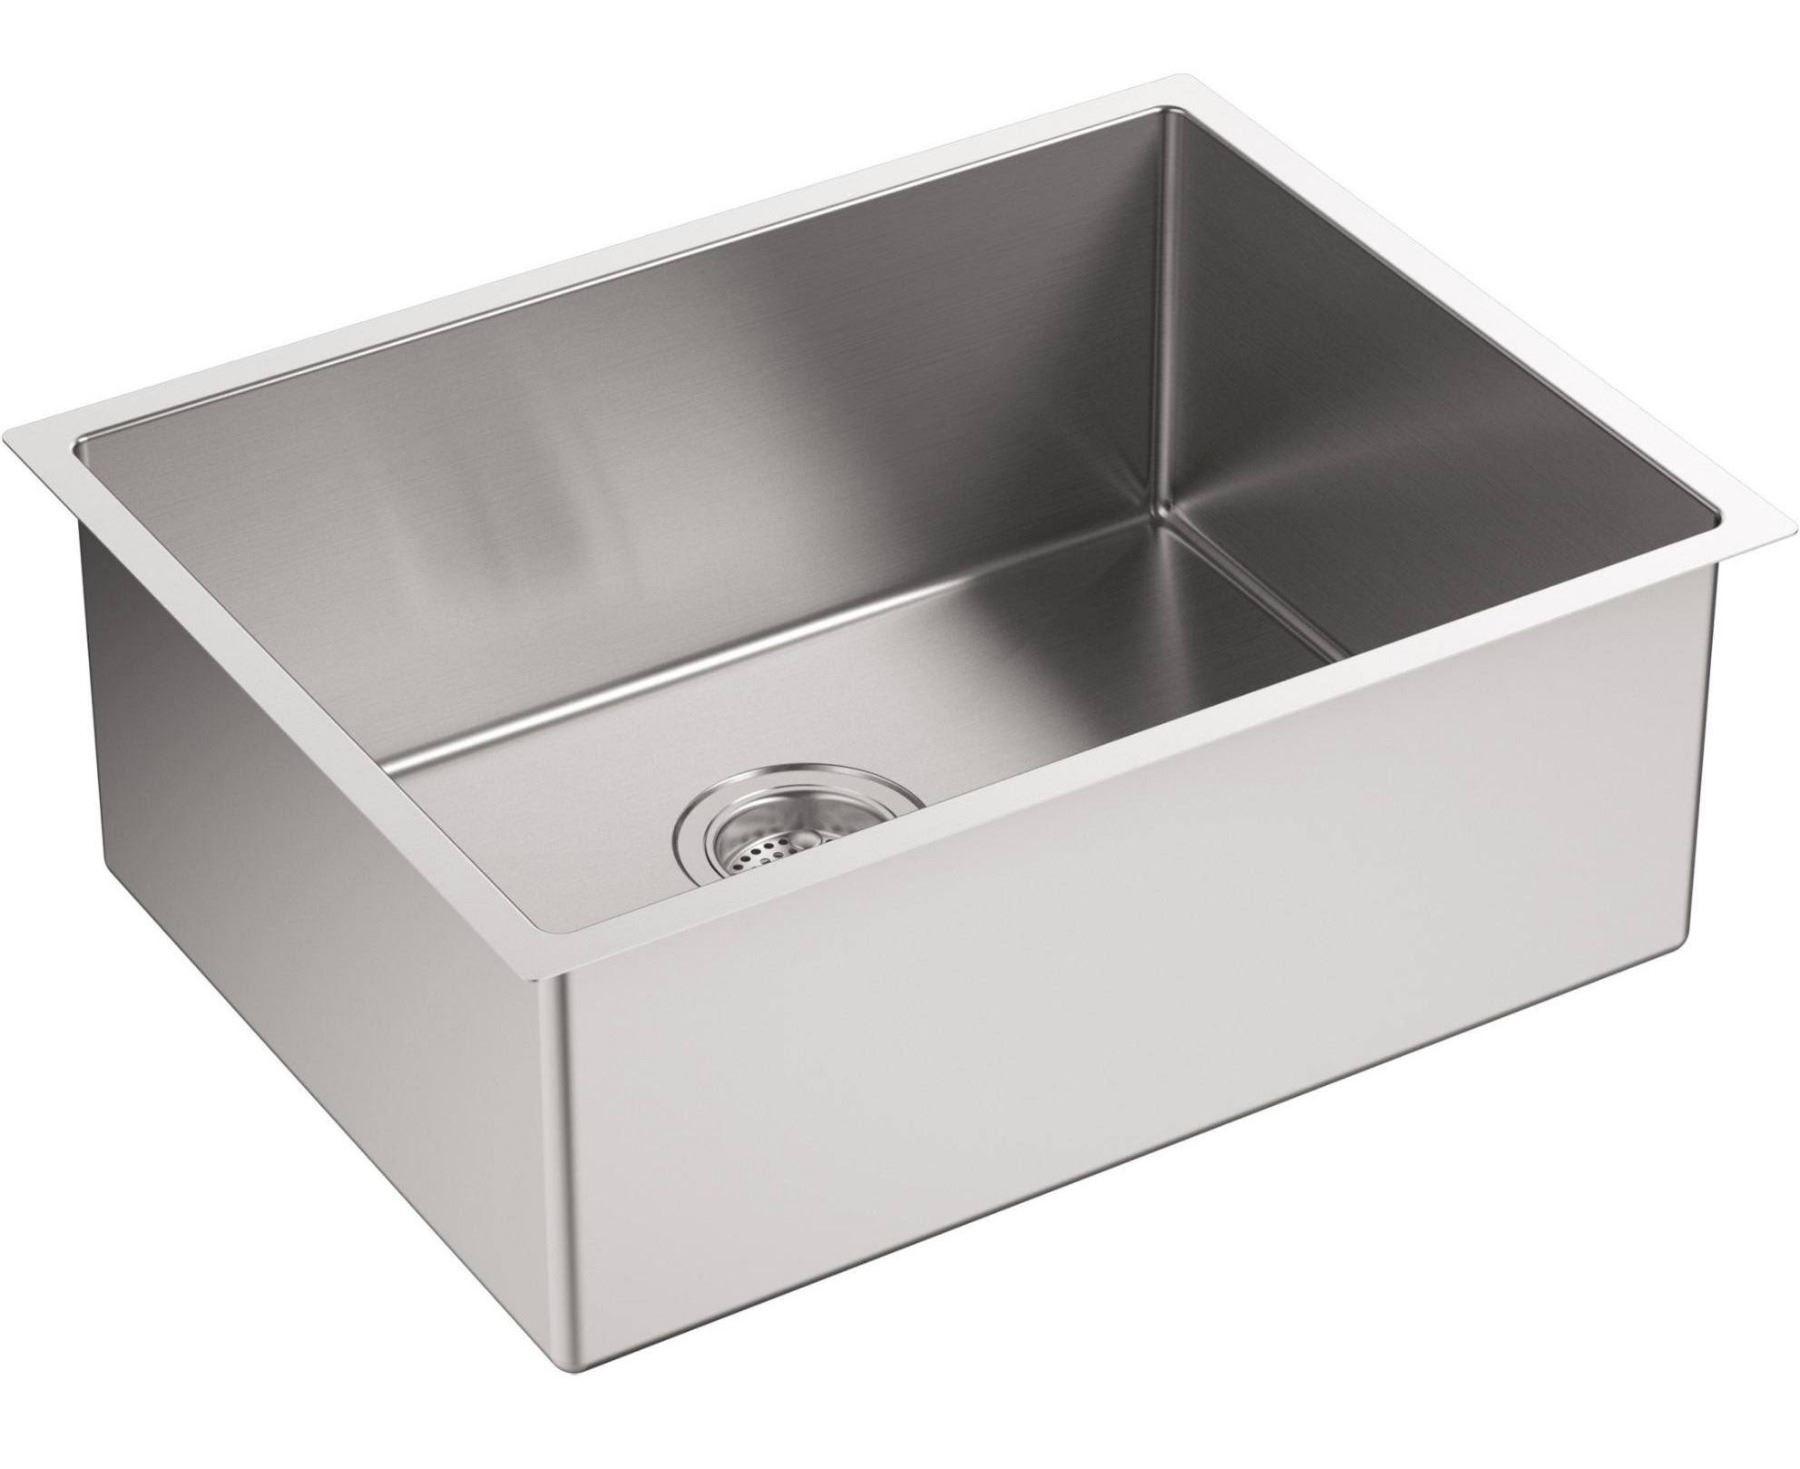 Kohler Strive Single Basin Undermount Kitchen Sink Model ...